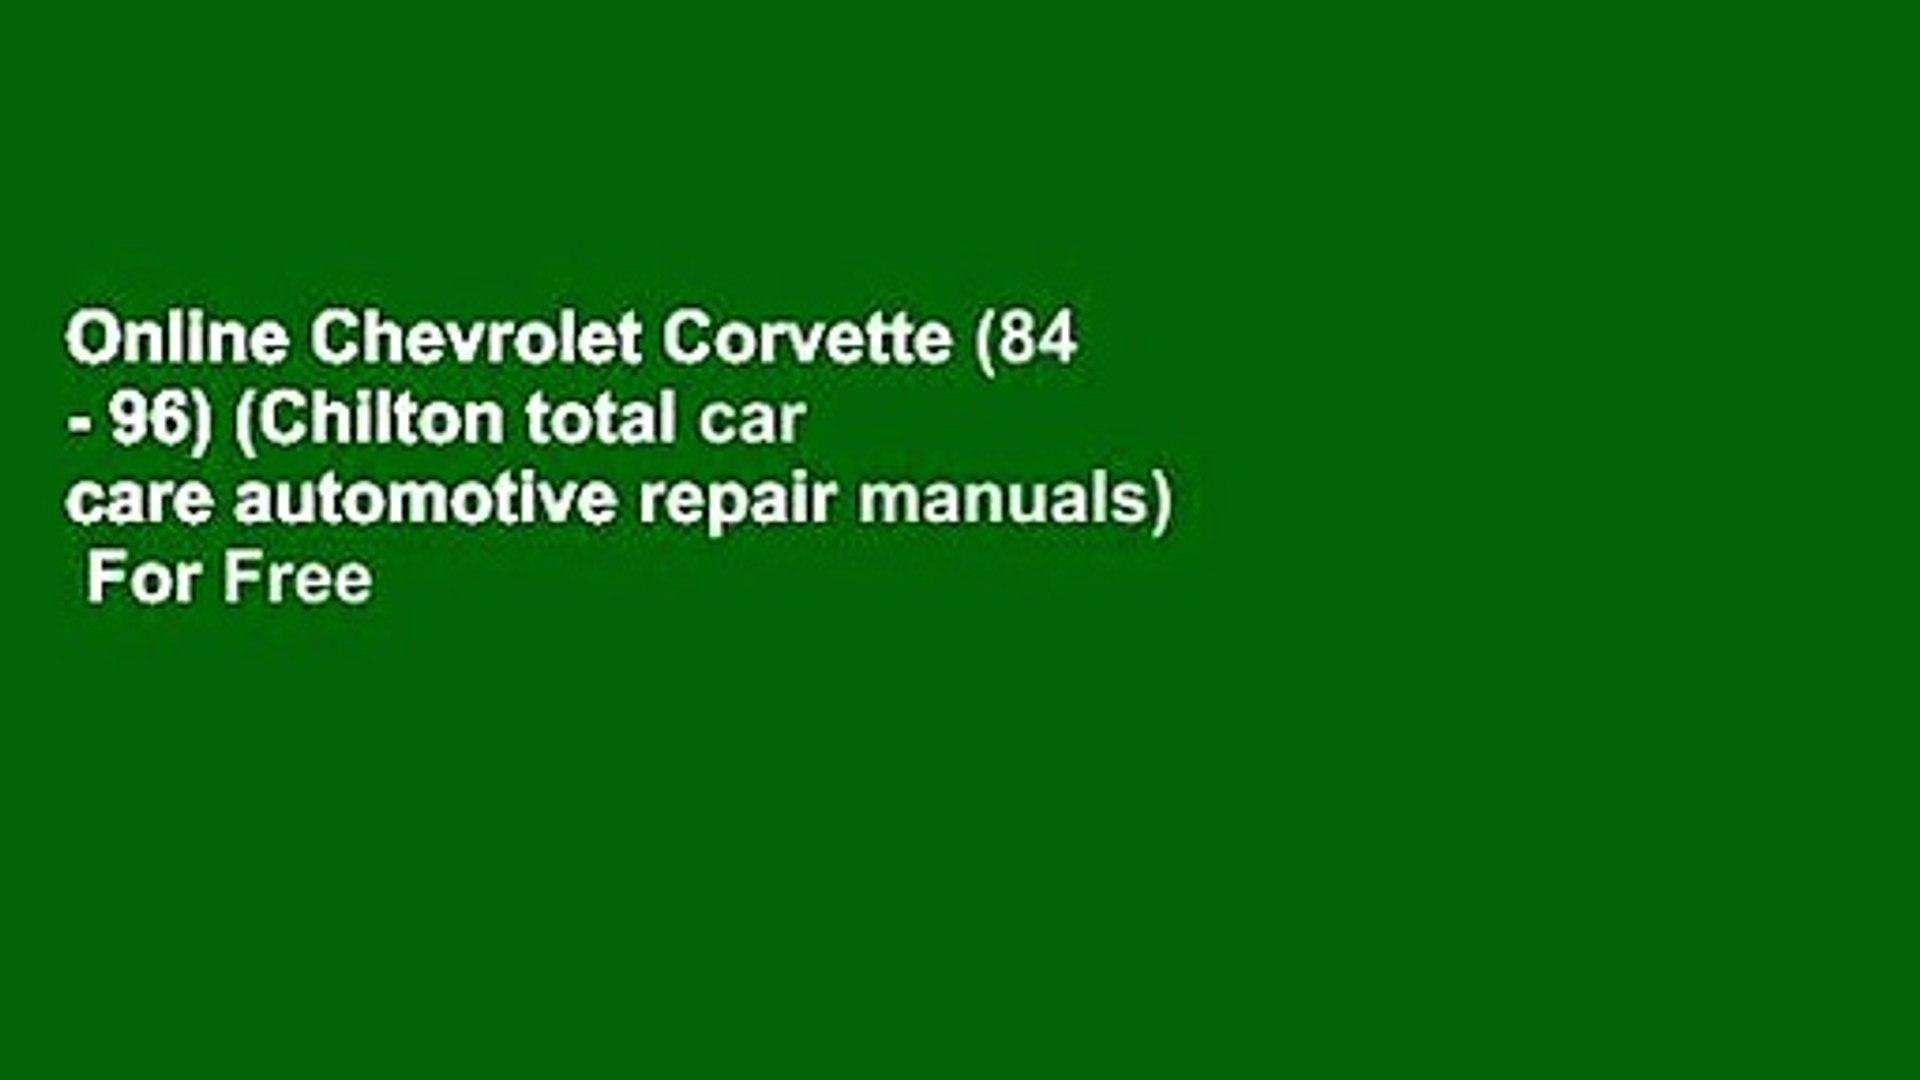 Auto Repair Manuals Free >> Online Chevrolet Corvette 84 96 Chilton Total Car Care